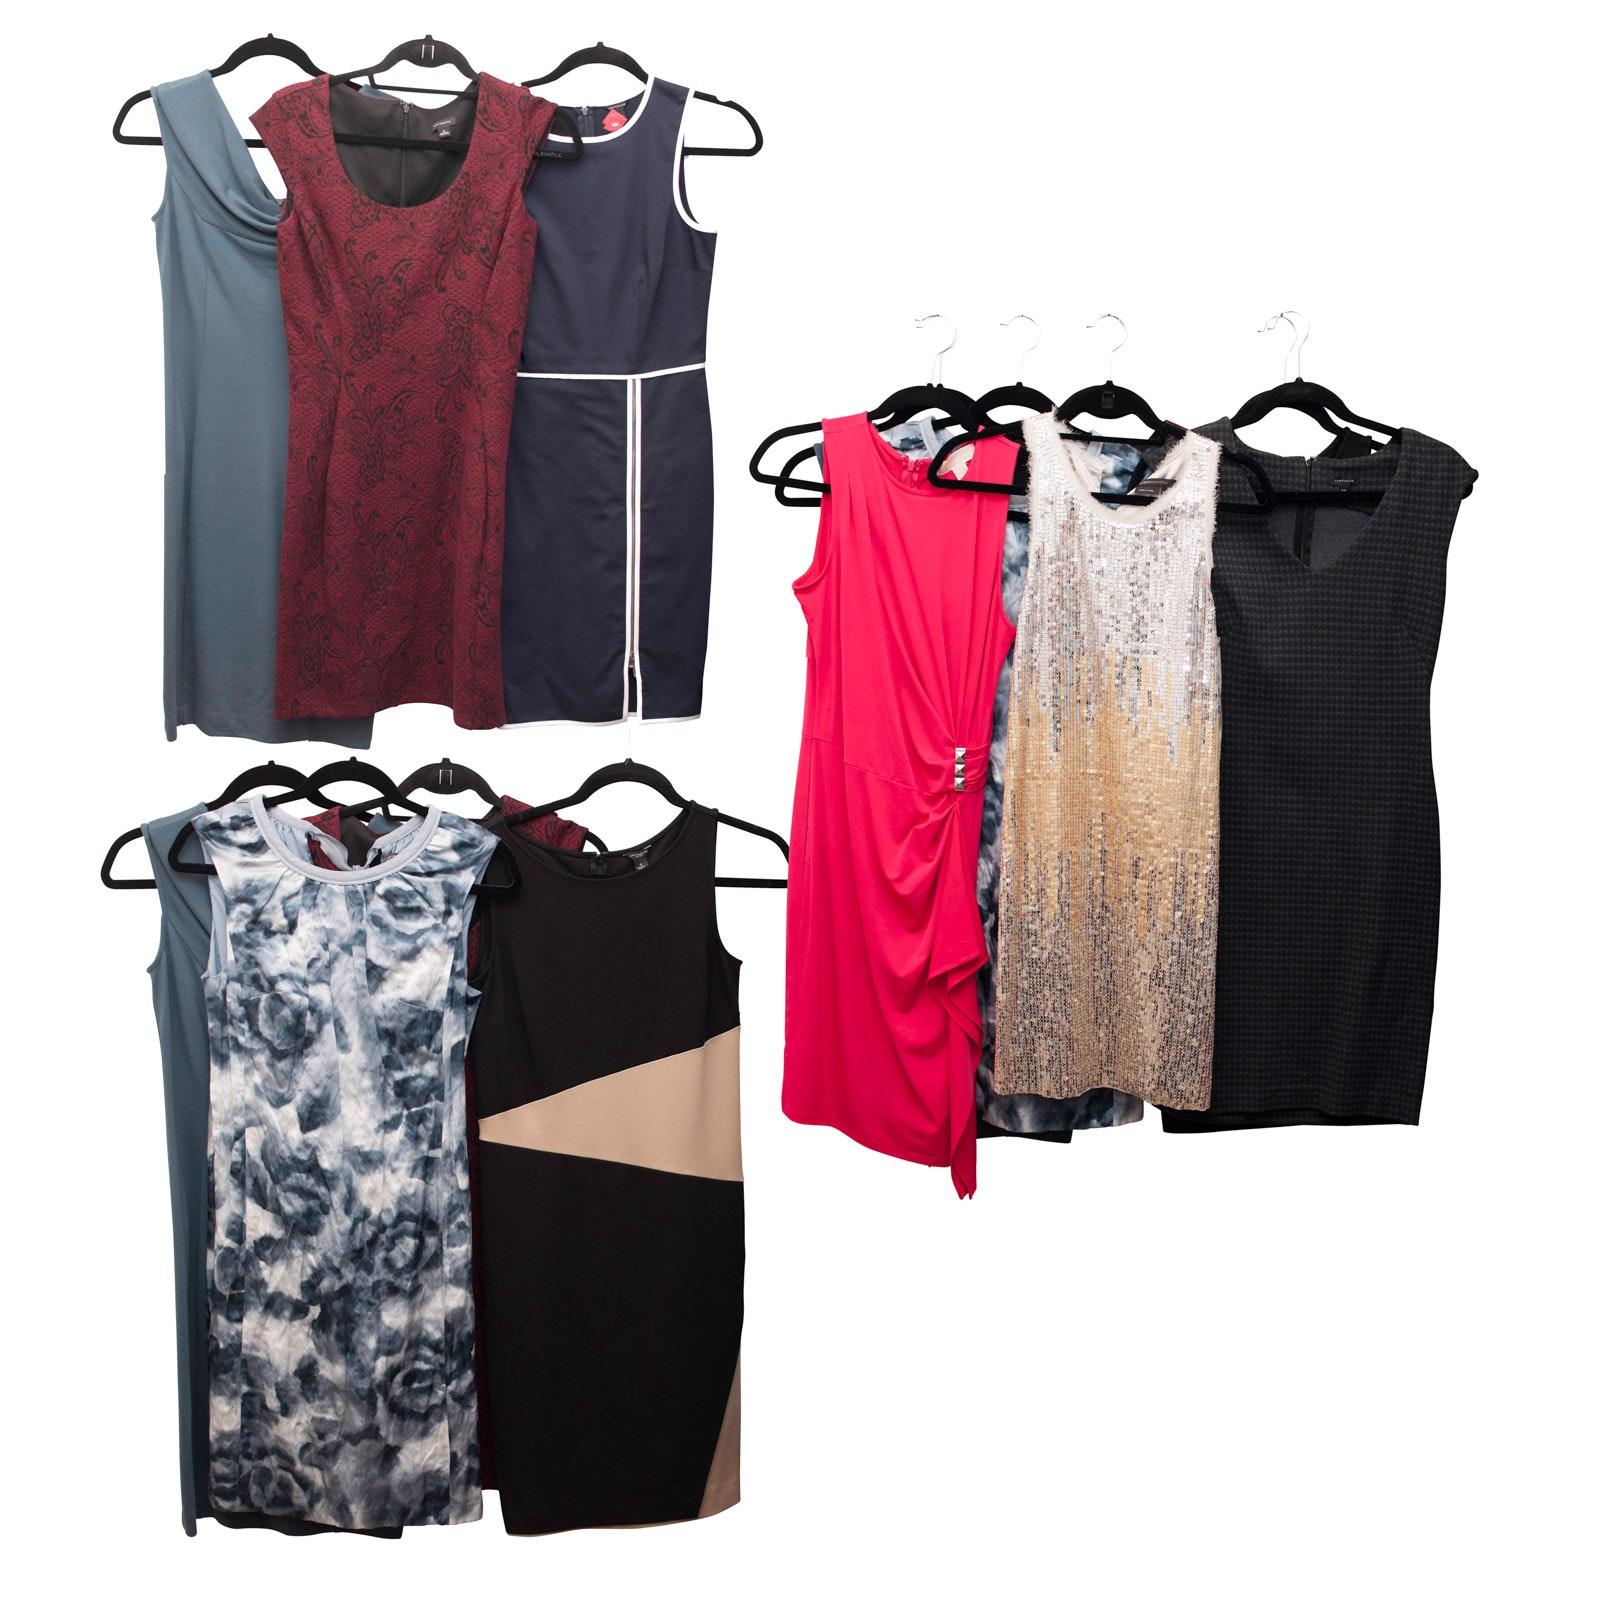 Women's Dresses including Ann Taylor, BCBG Max Azria and MICHAEL Michael Kors